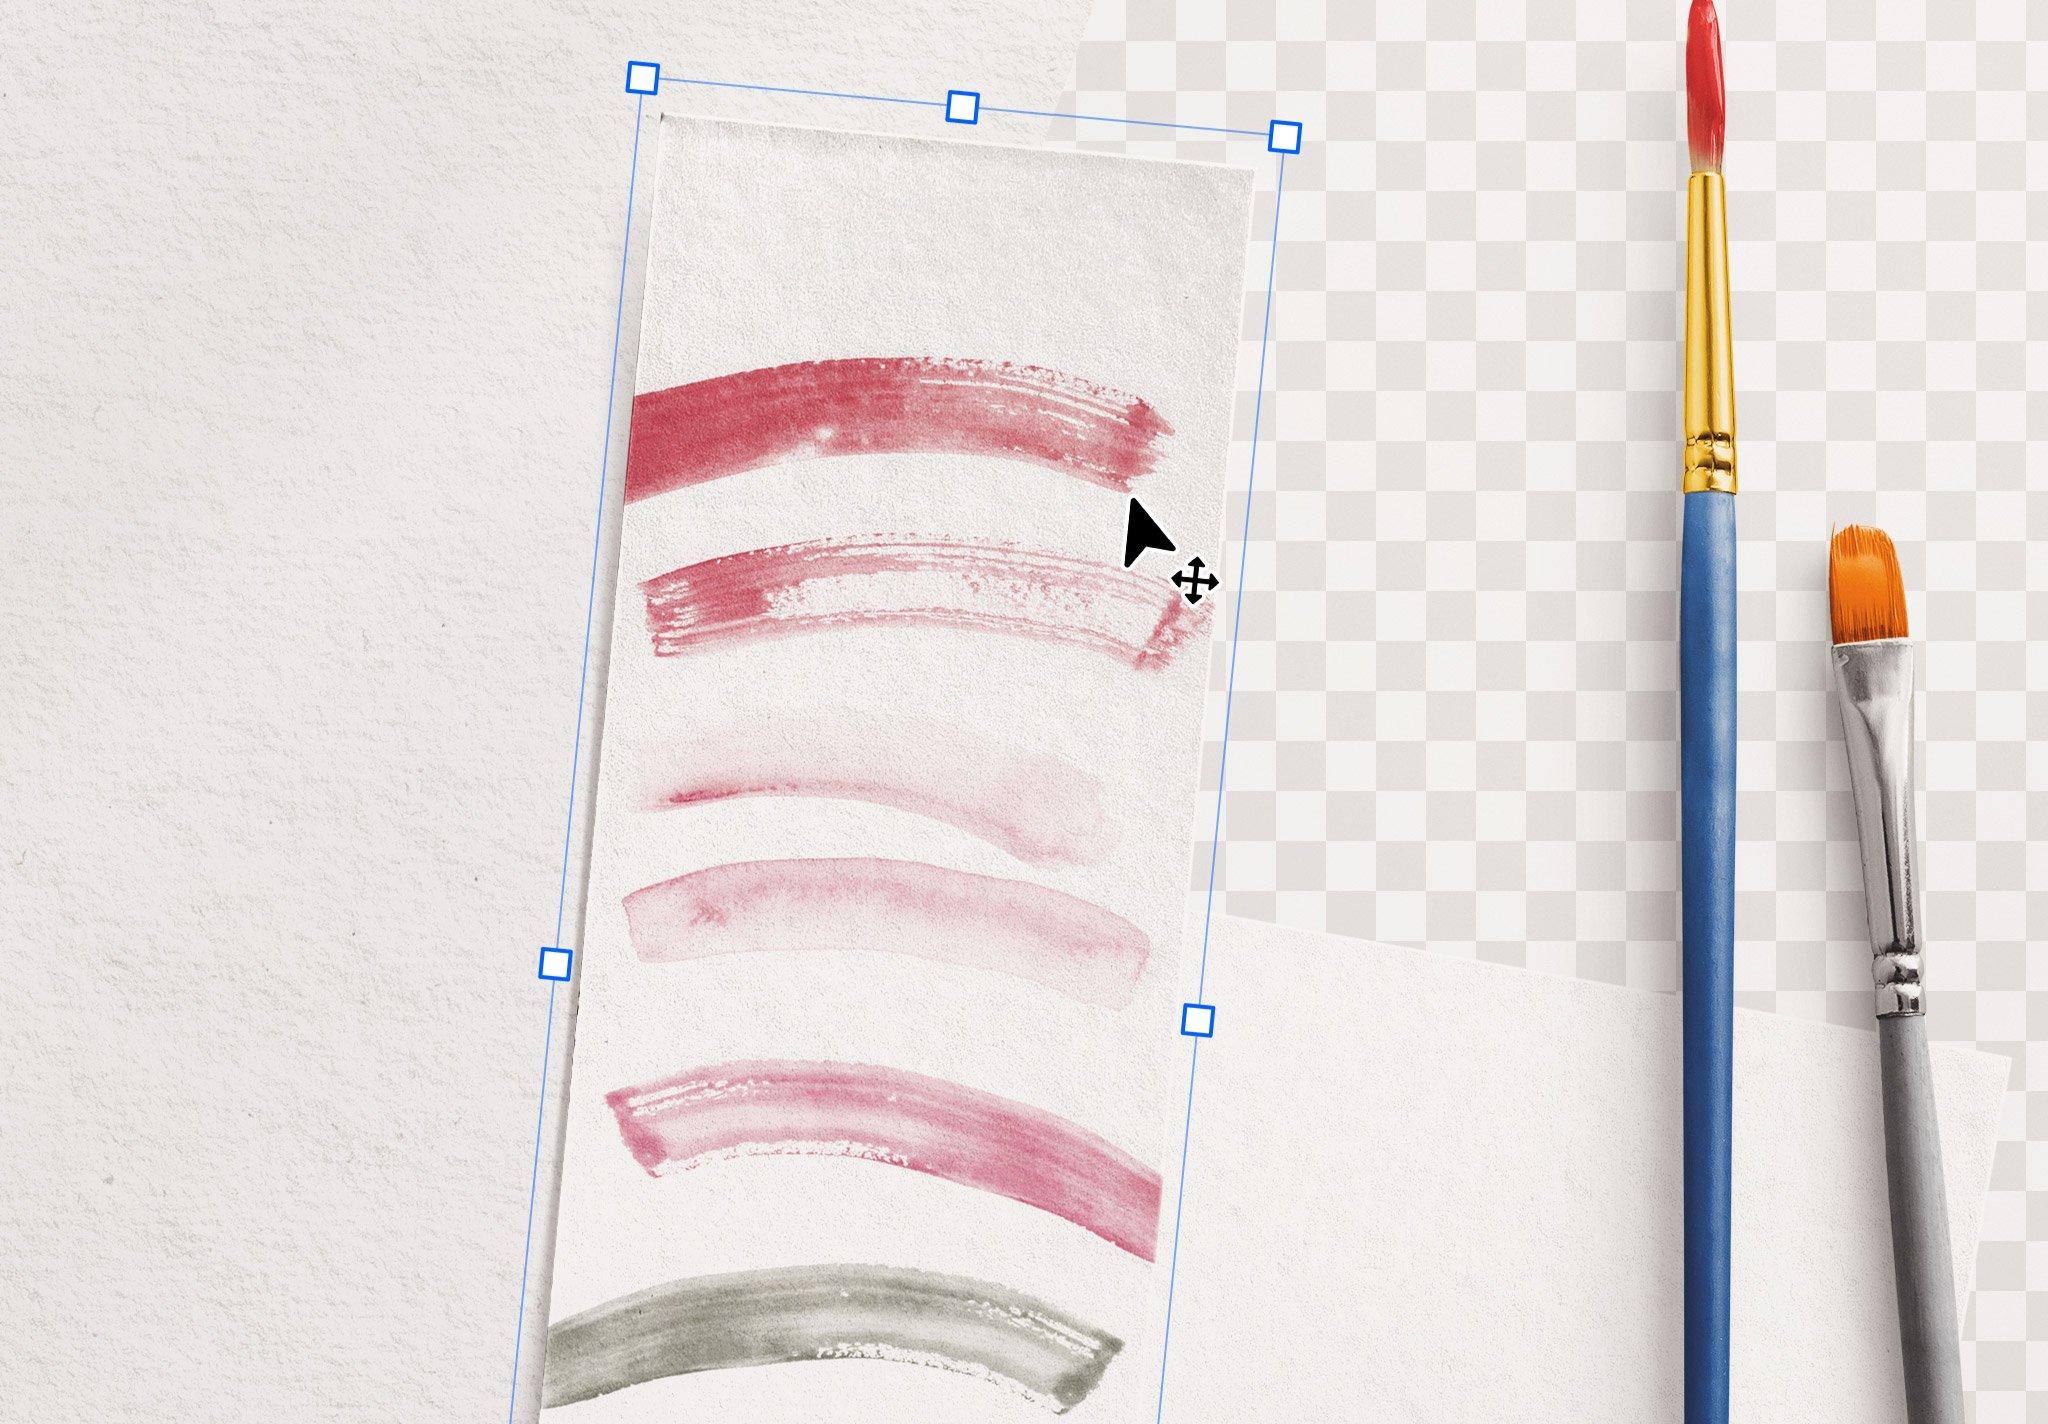 watercolor mockup scene creator 2 image01